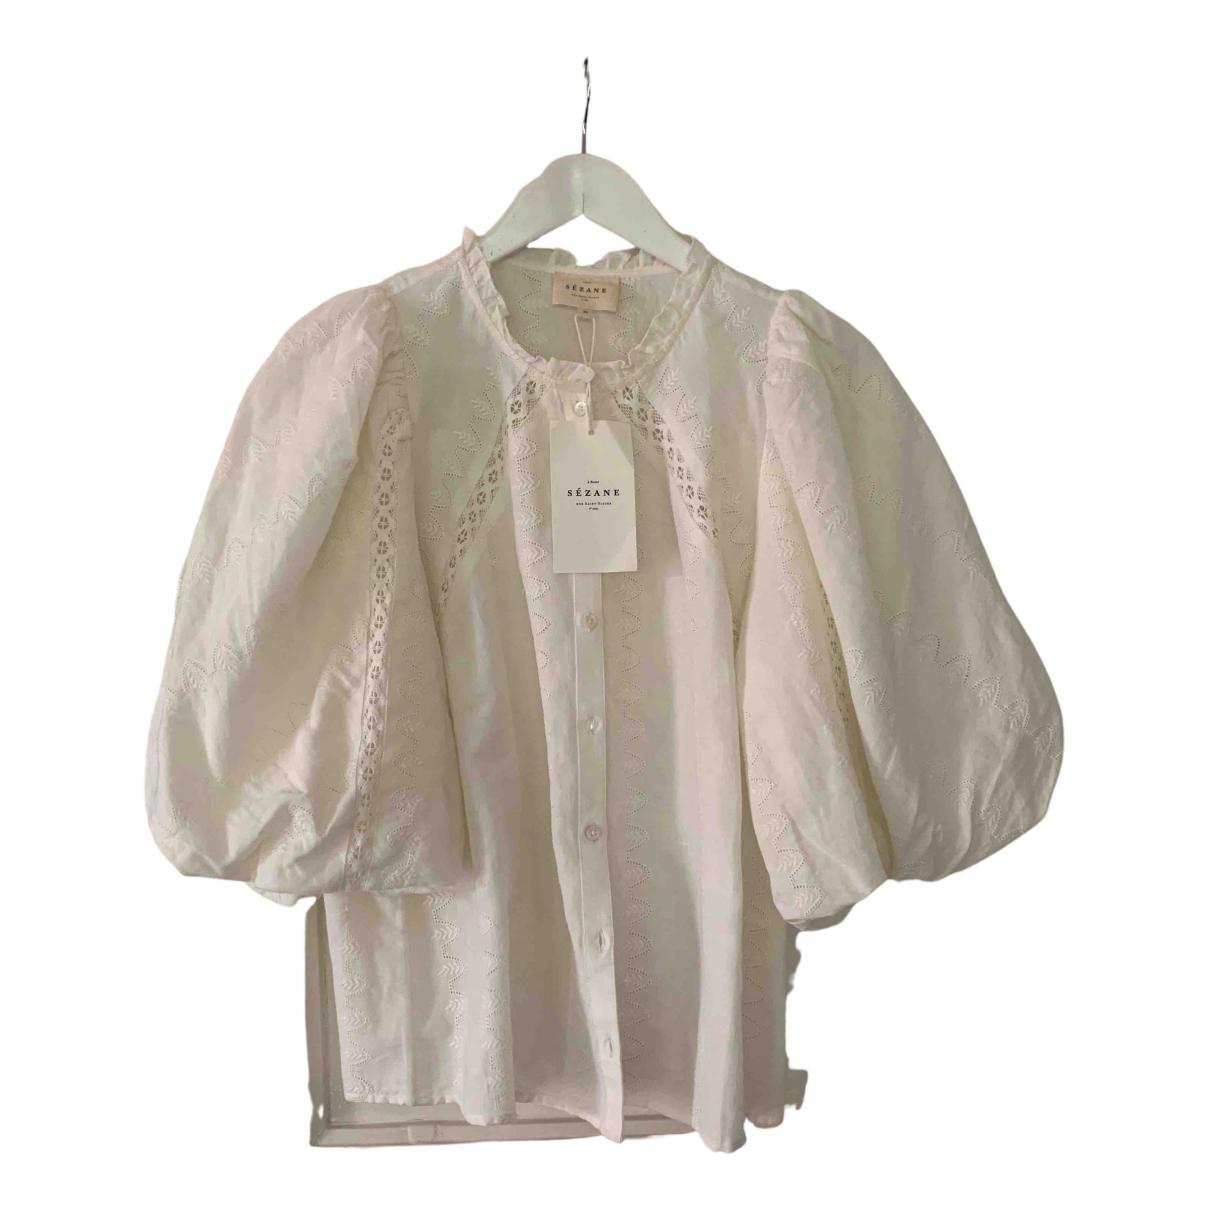 Sézane Spring Summer 2020 Ecru Cotton  top for Women 38 FR